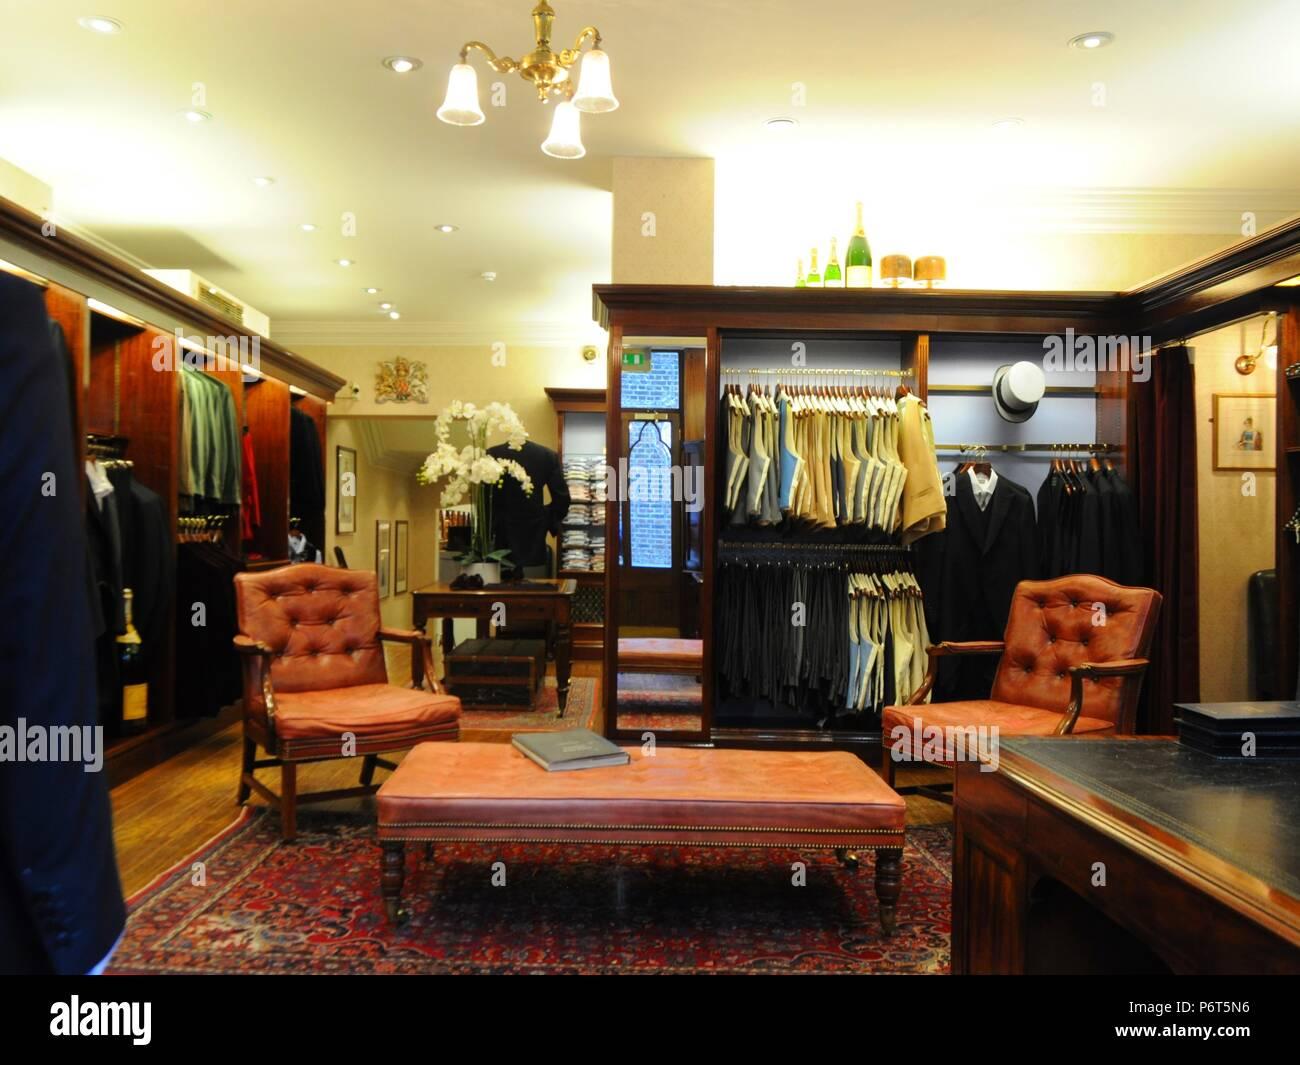 Interior of Ede & Ravenscroft Tailors on Chancery Lane, London, UK. - Stock Image